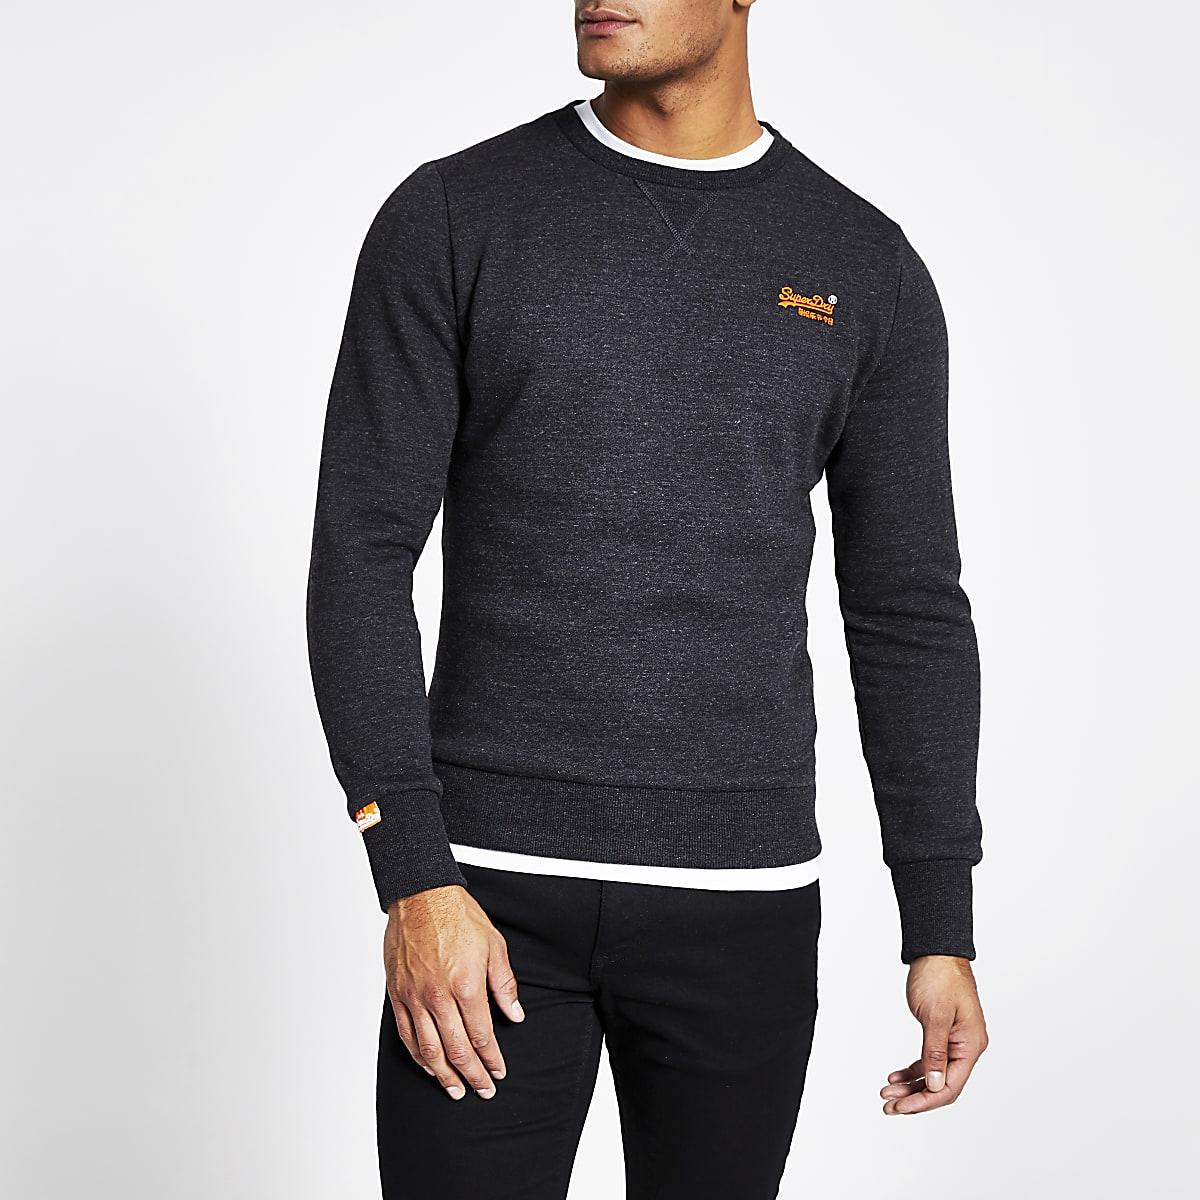 Superdry black embroidered sweatshirt